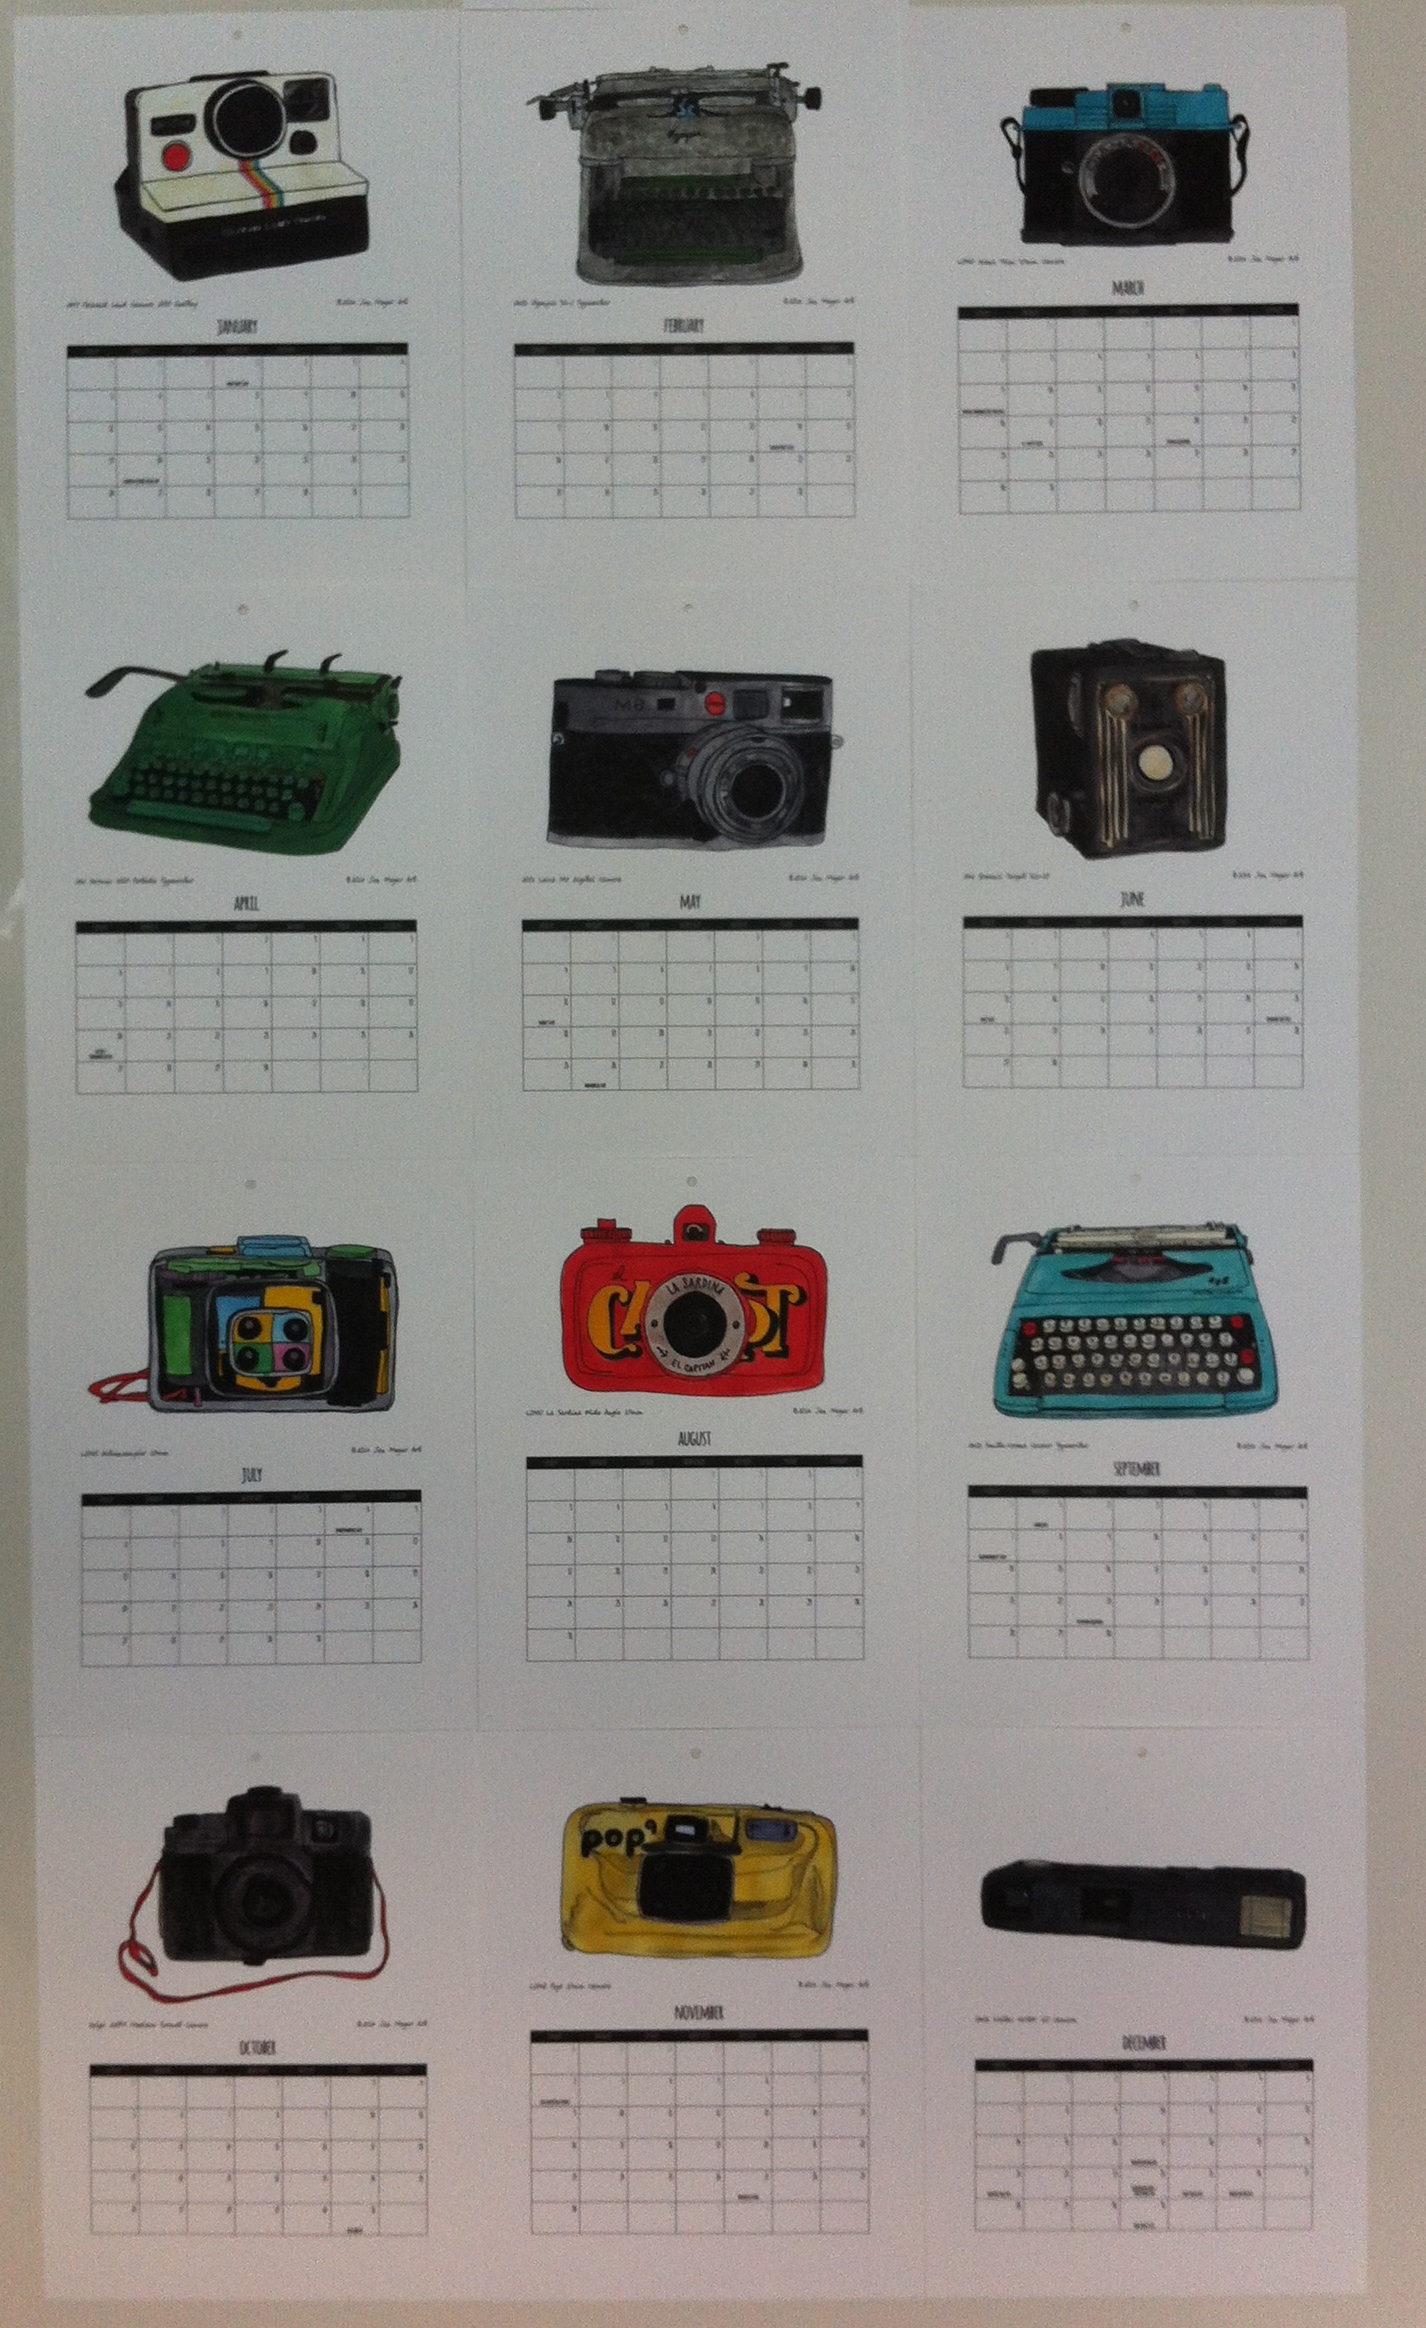 2014 calendar by Jen Meyer